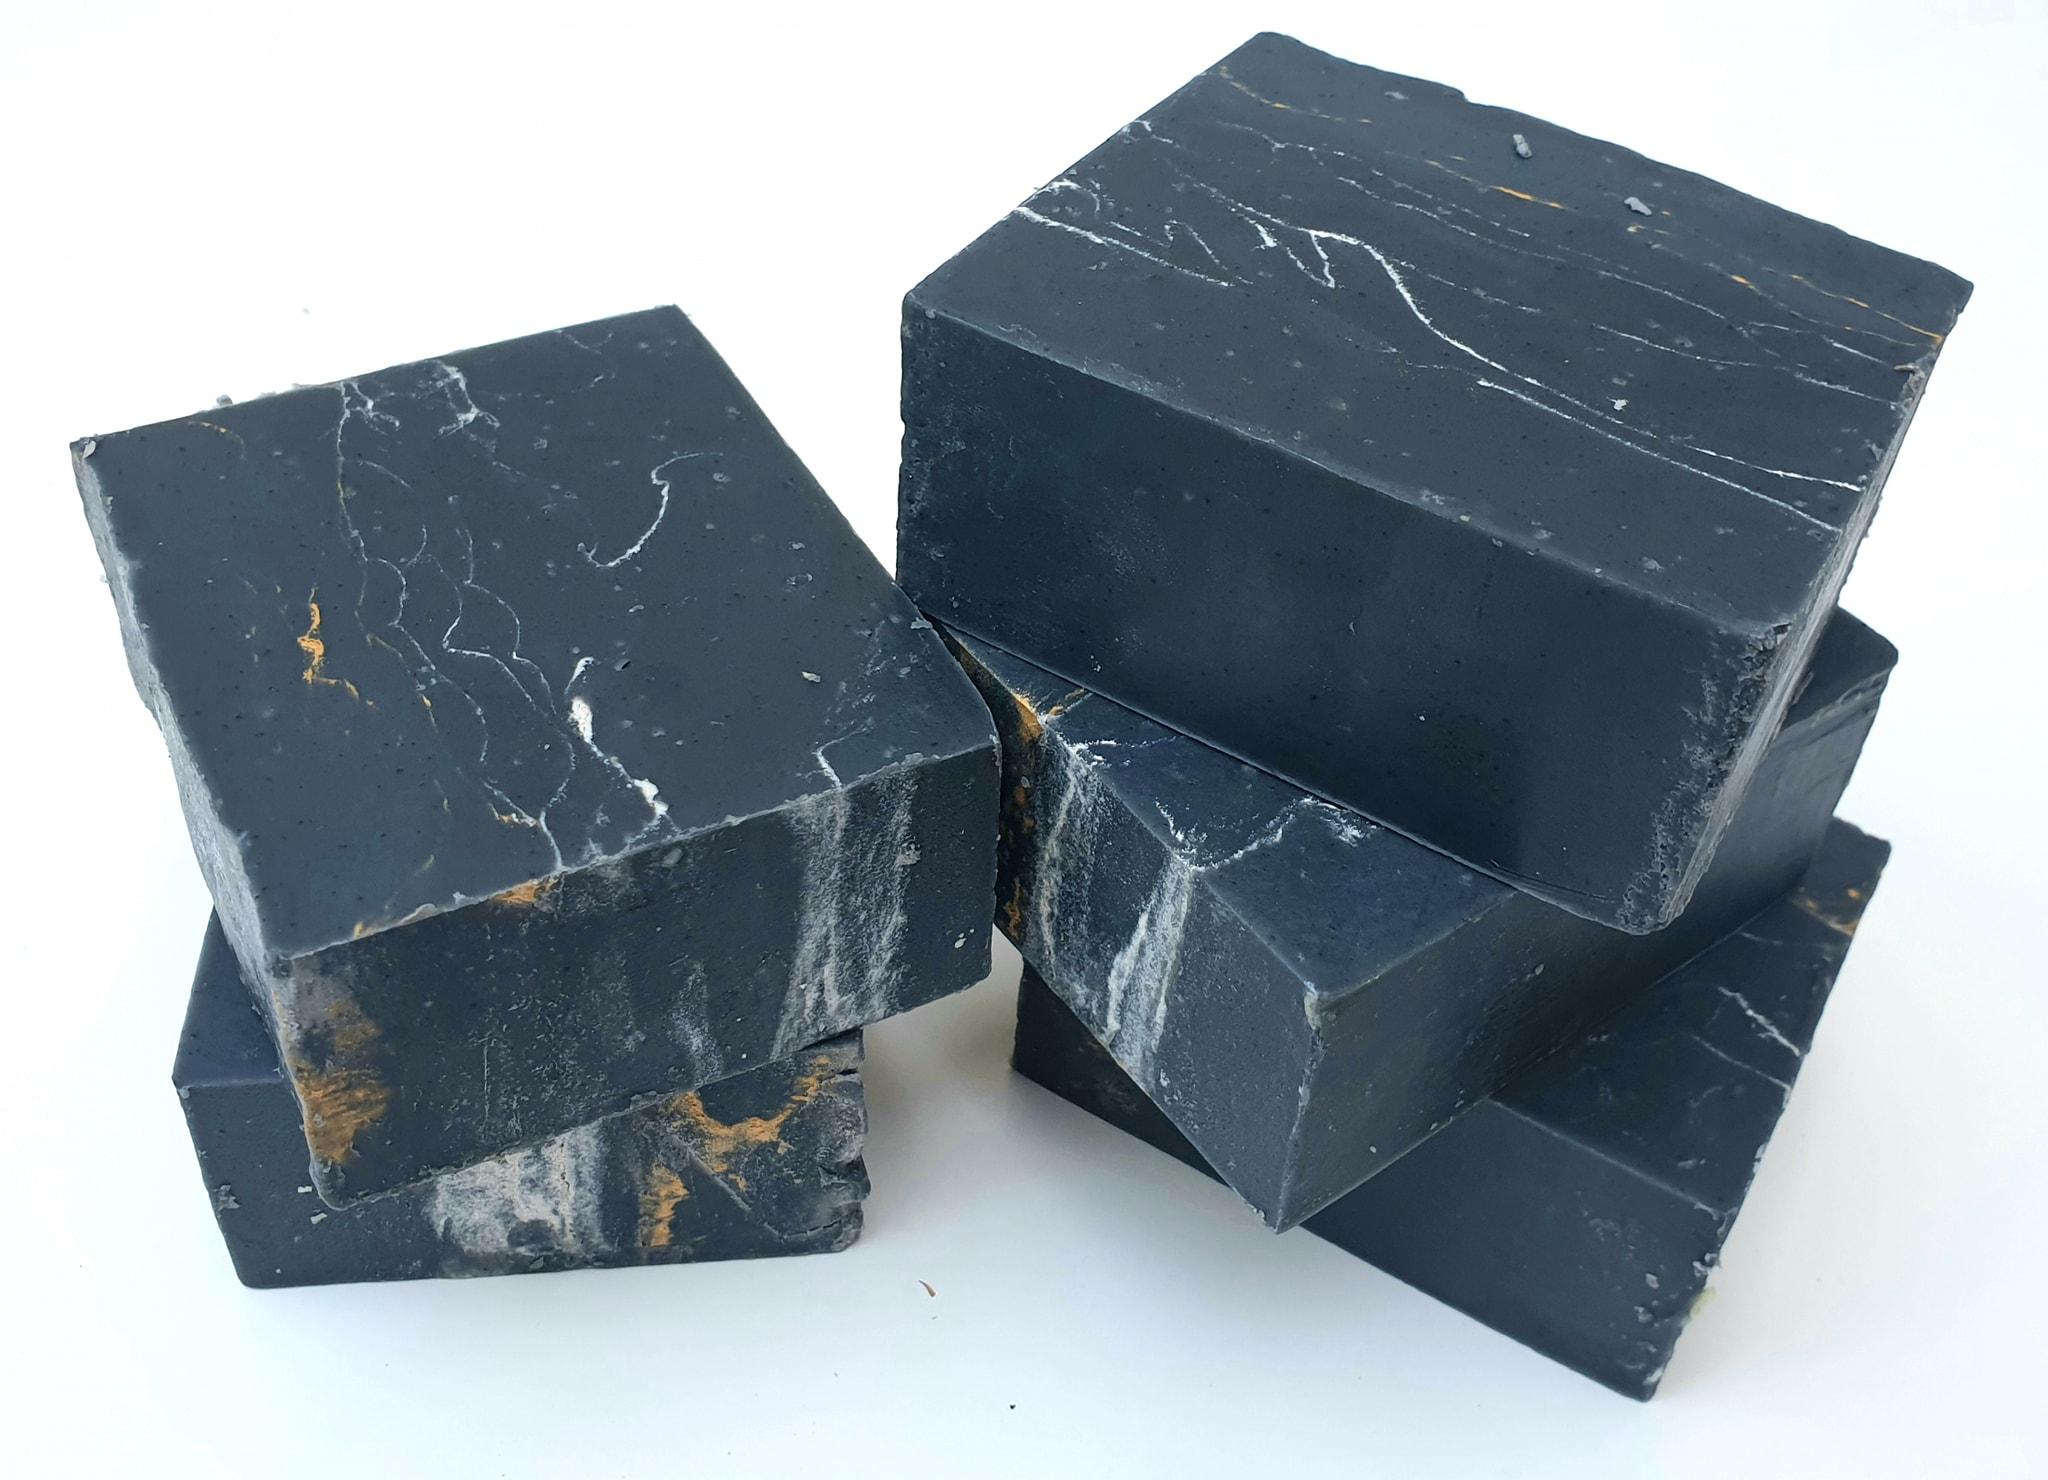 סבון שיש פחם פעיל